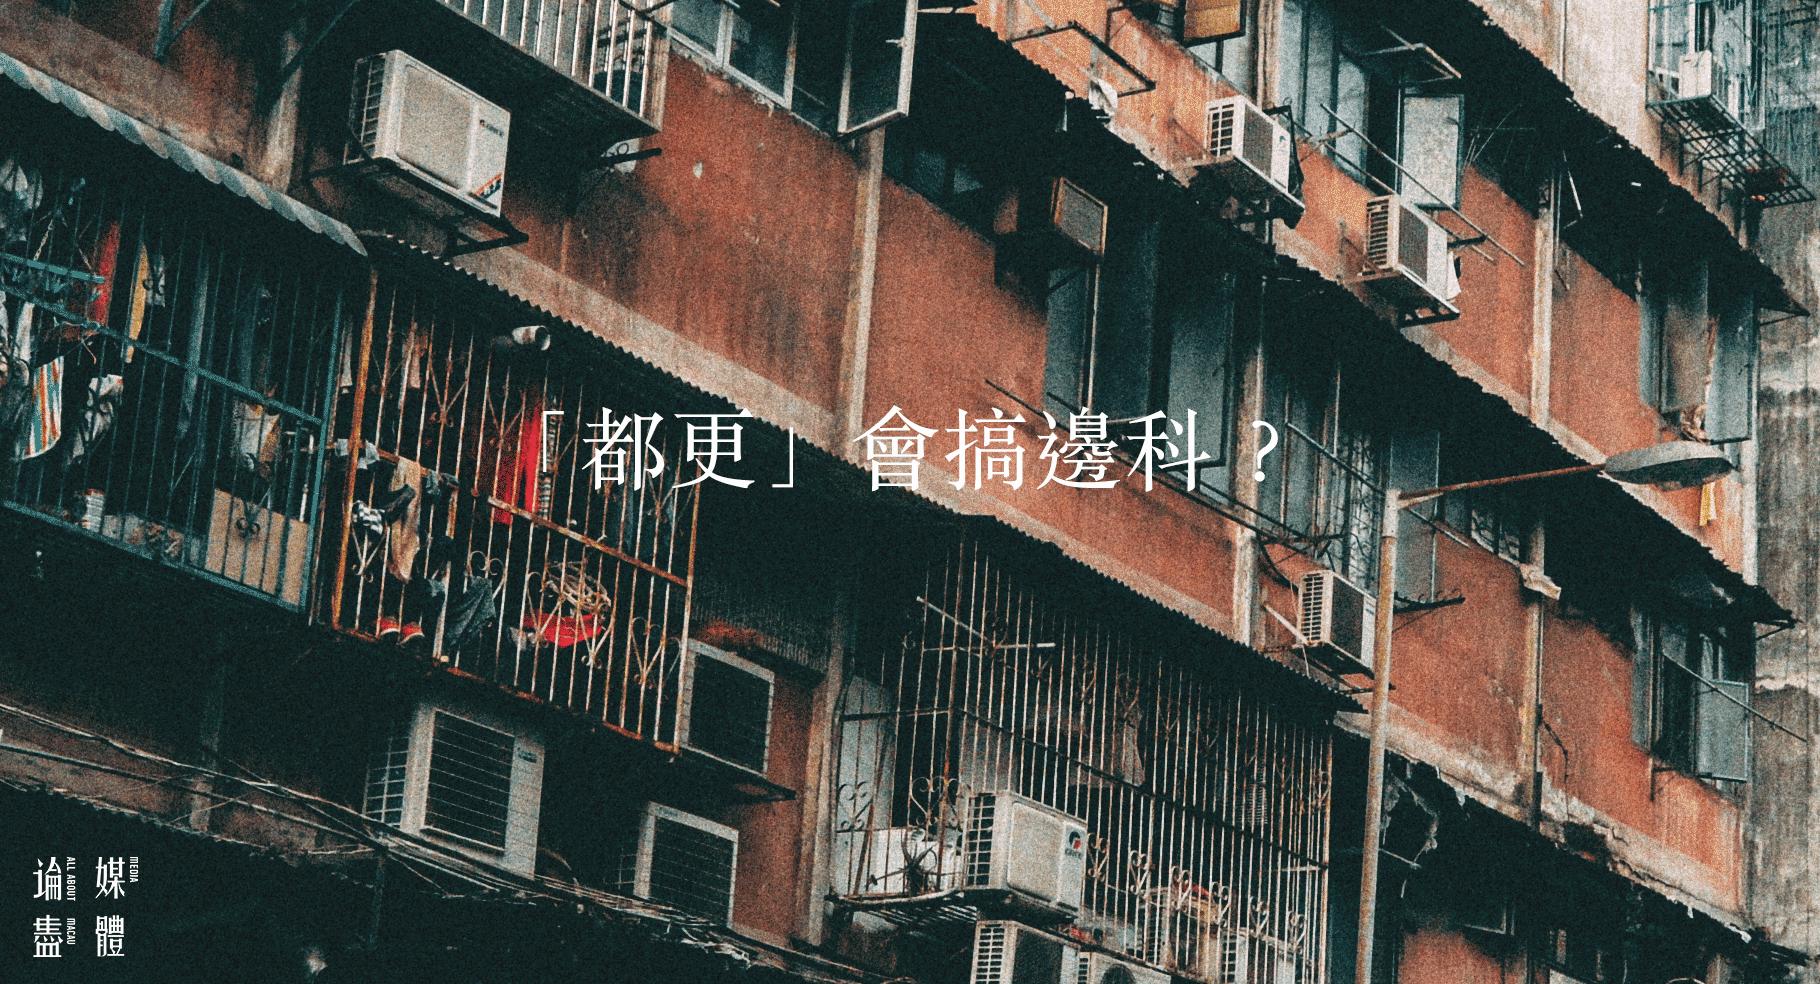 2016-12-22-web-banner